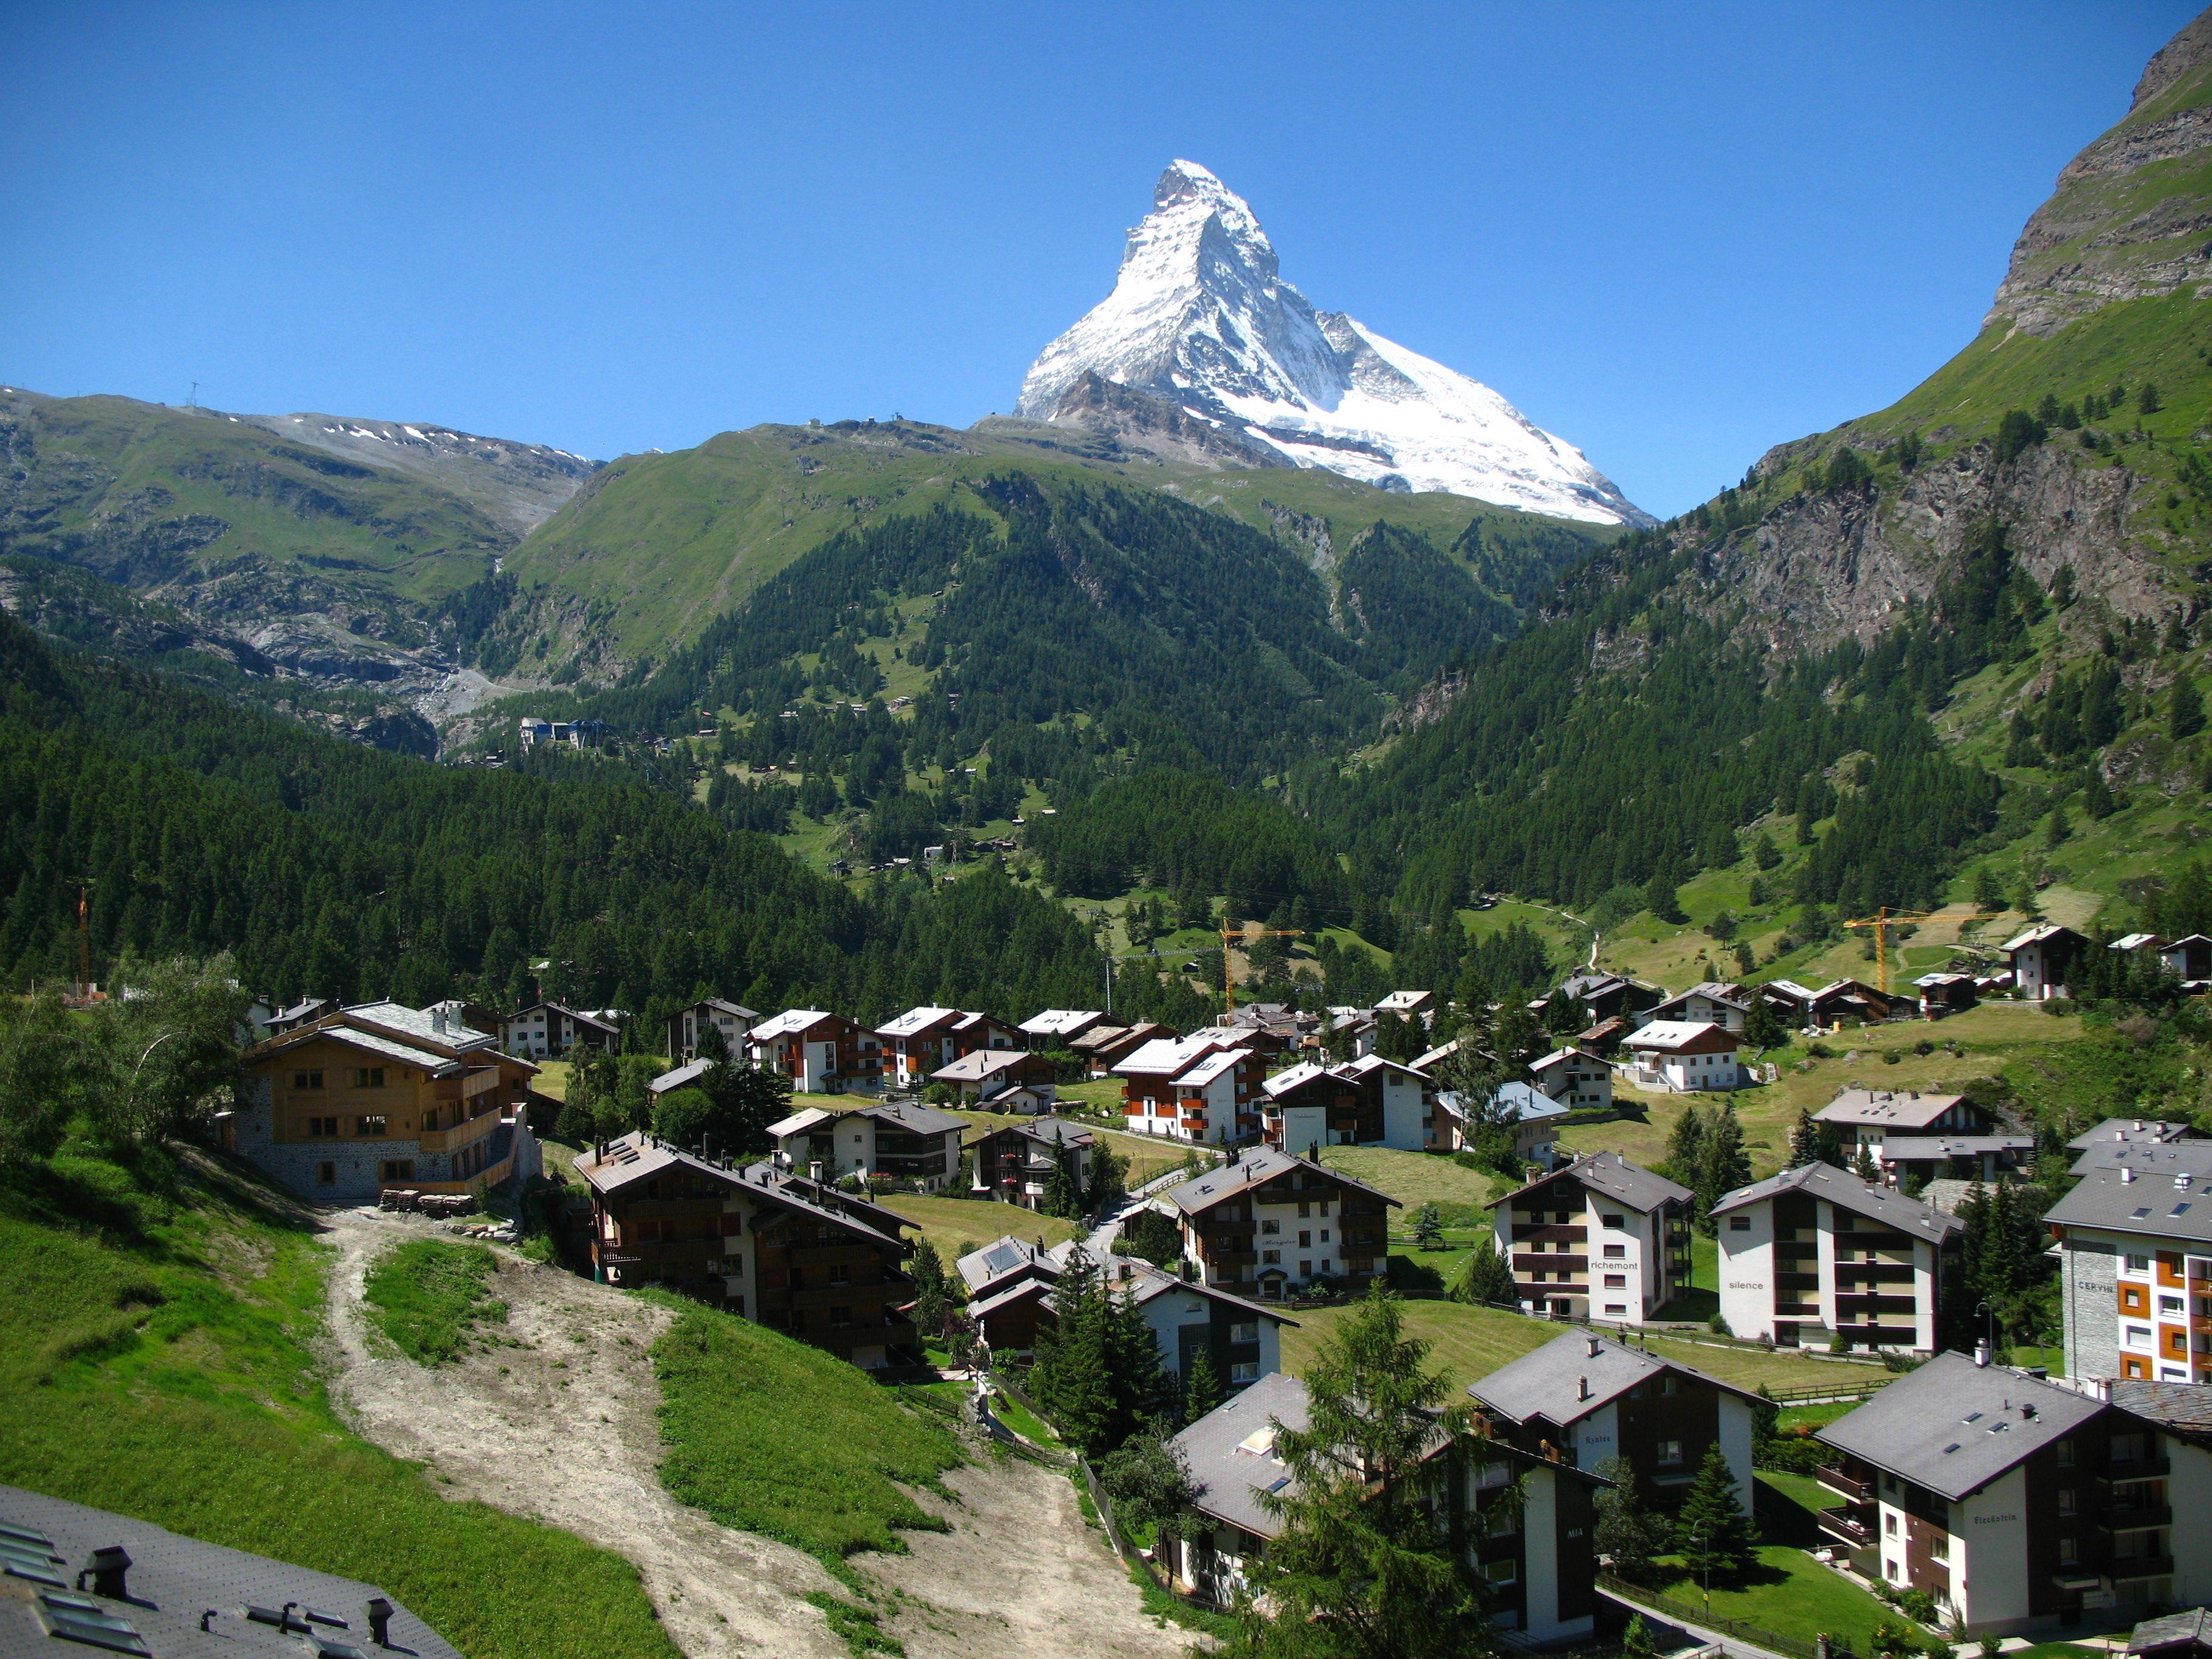 View of Matterhorn from Winkelmatten - in the German-speaking section of the canton of Valais, Switzerland